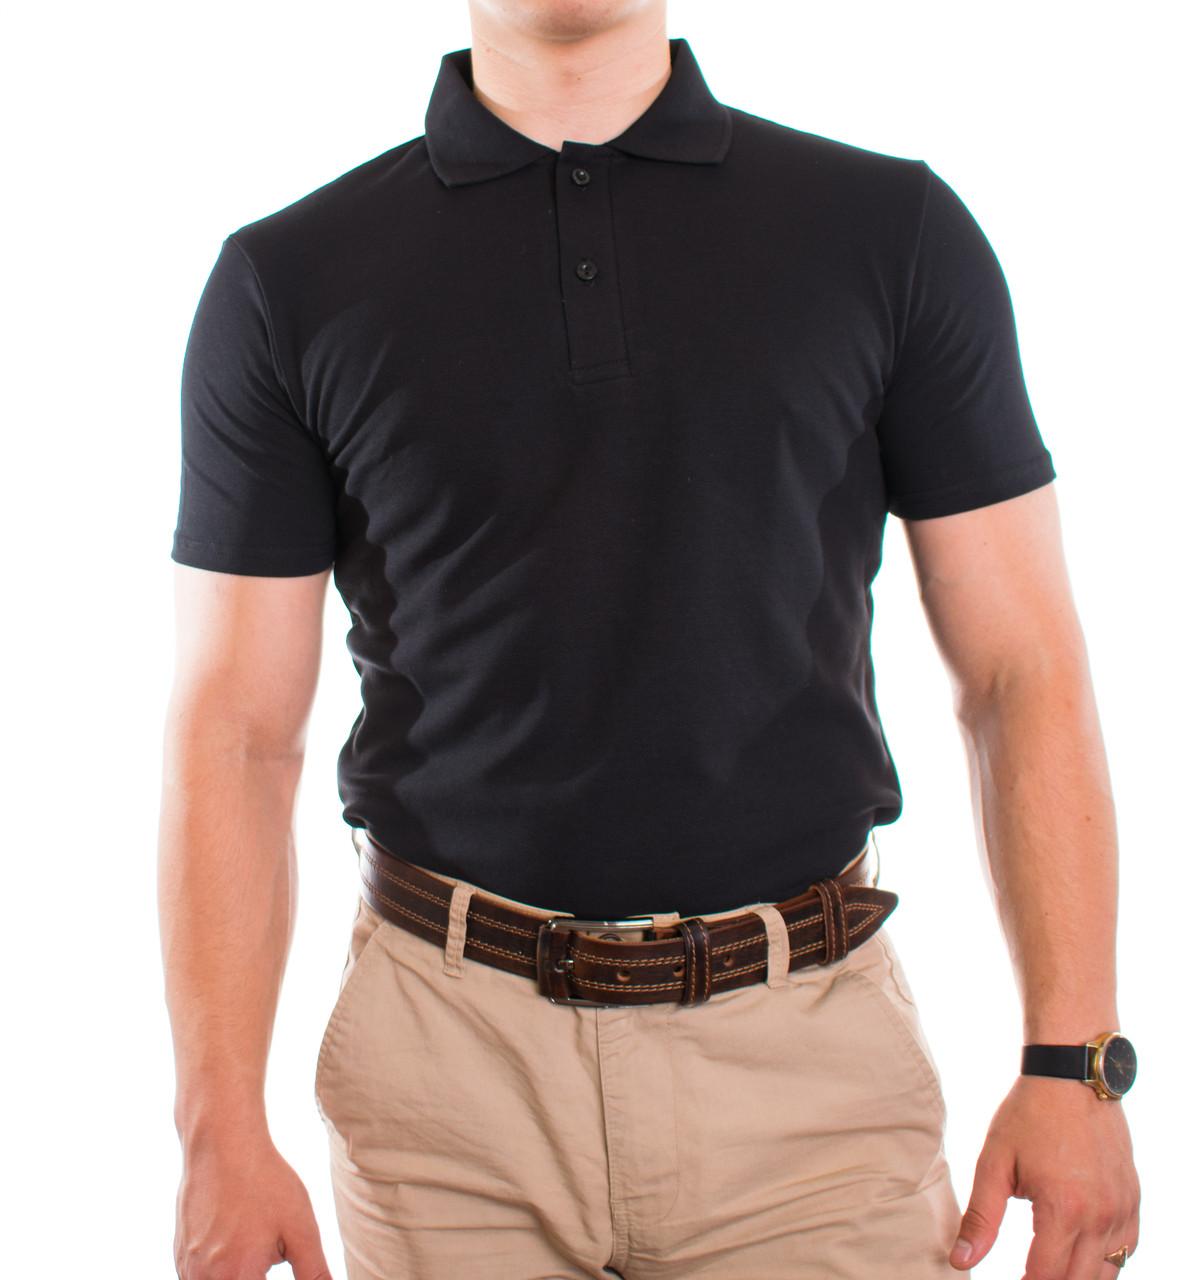 Bono Мужская футболка Поло черная 400001